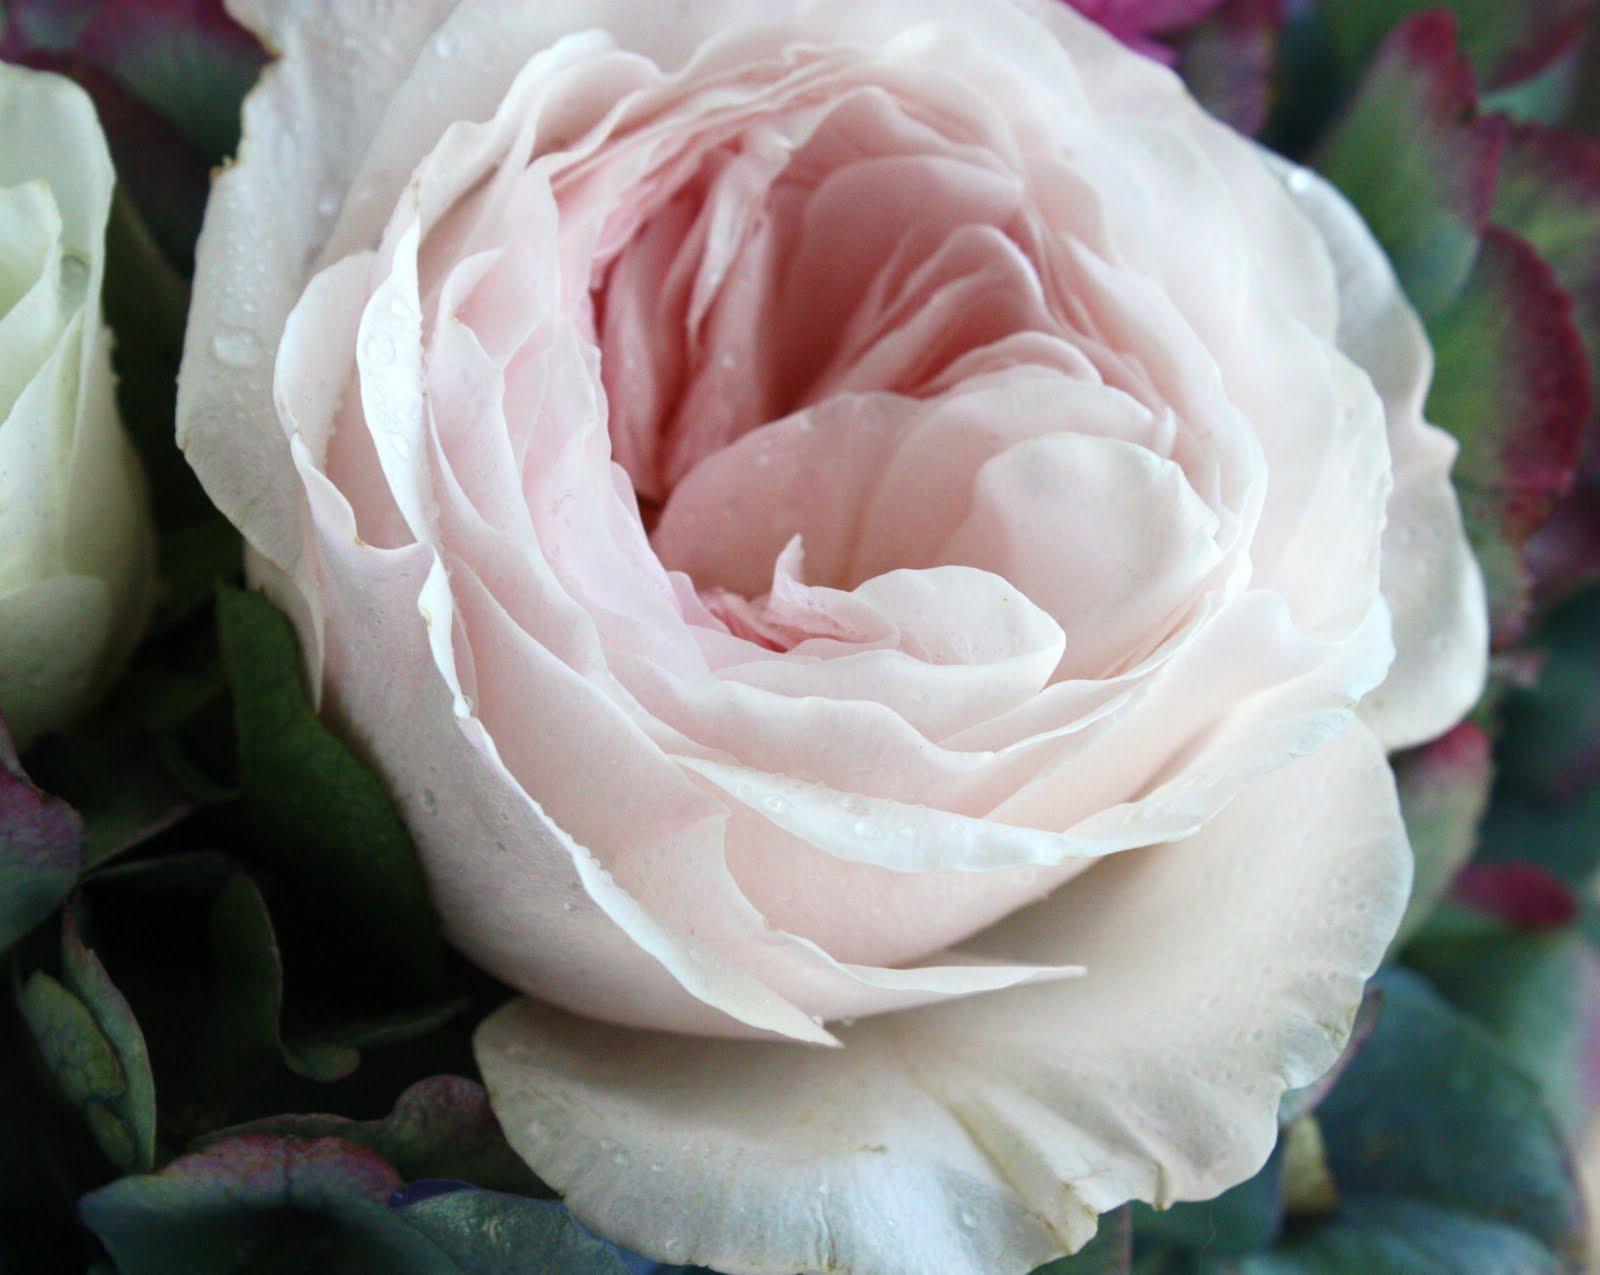 garden rose detail garden rosejpg - Garden Rose